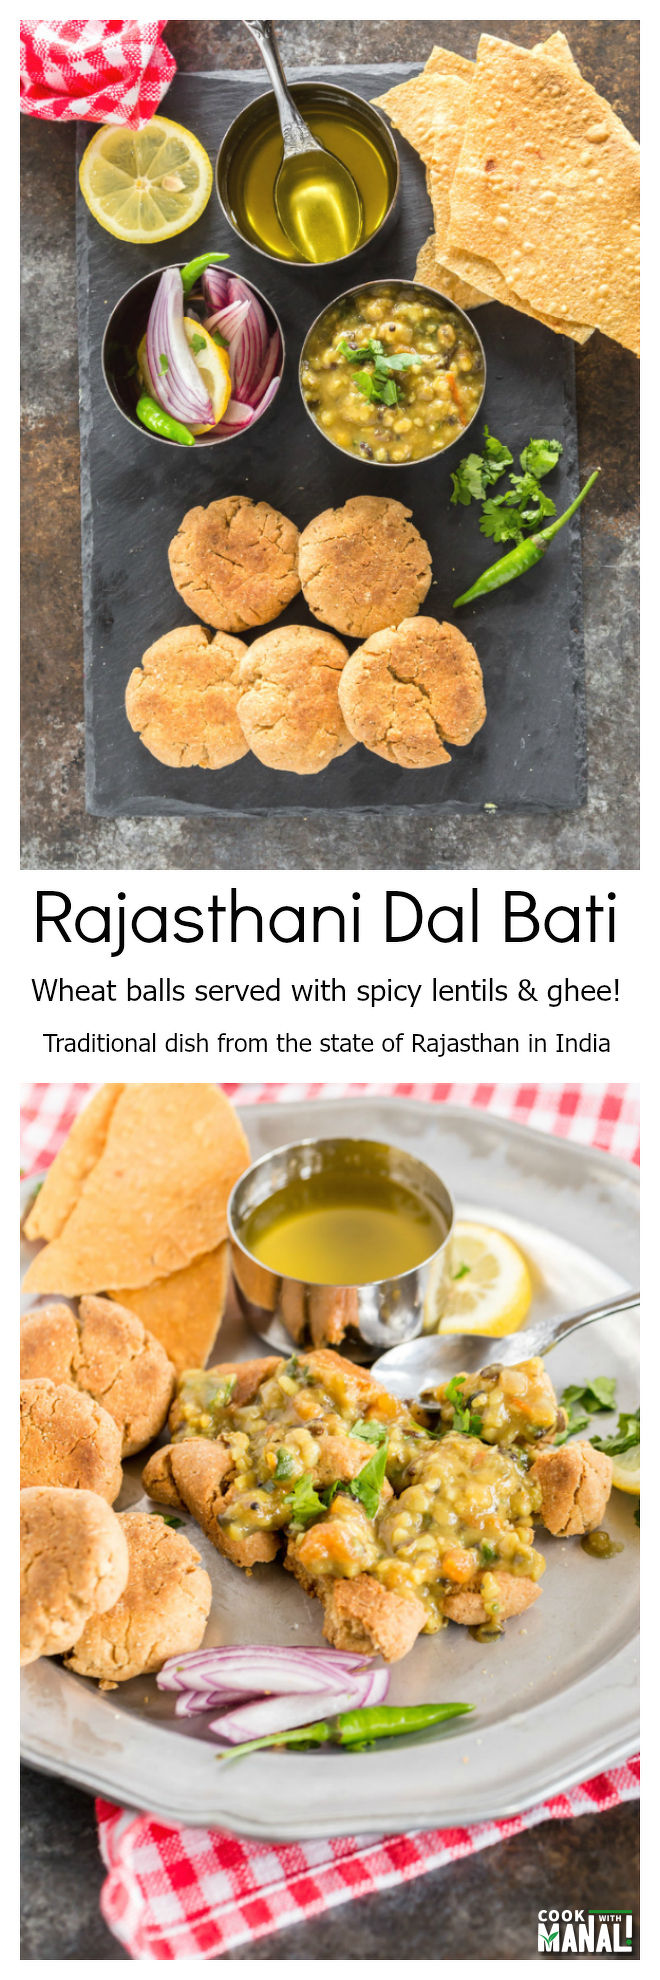 Rajasthani Dal Bati Collage